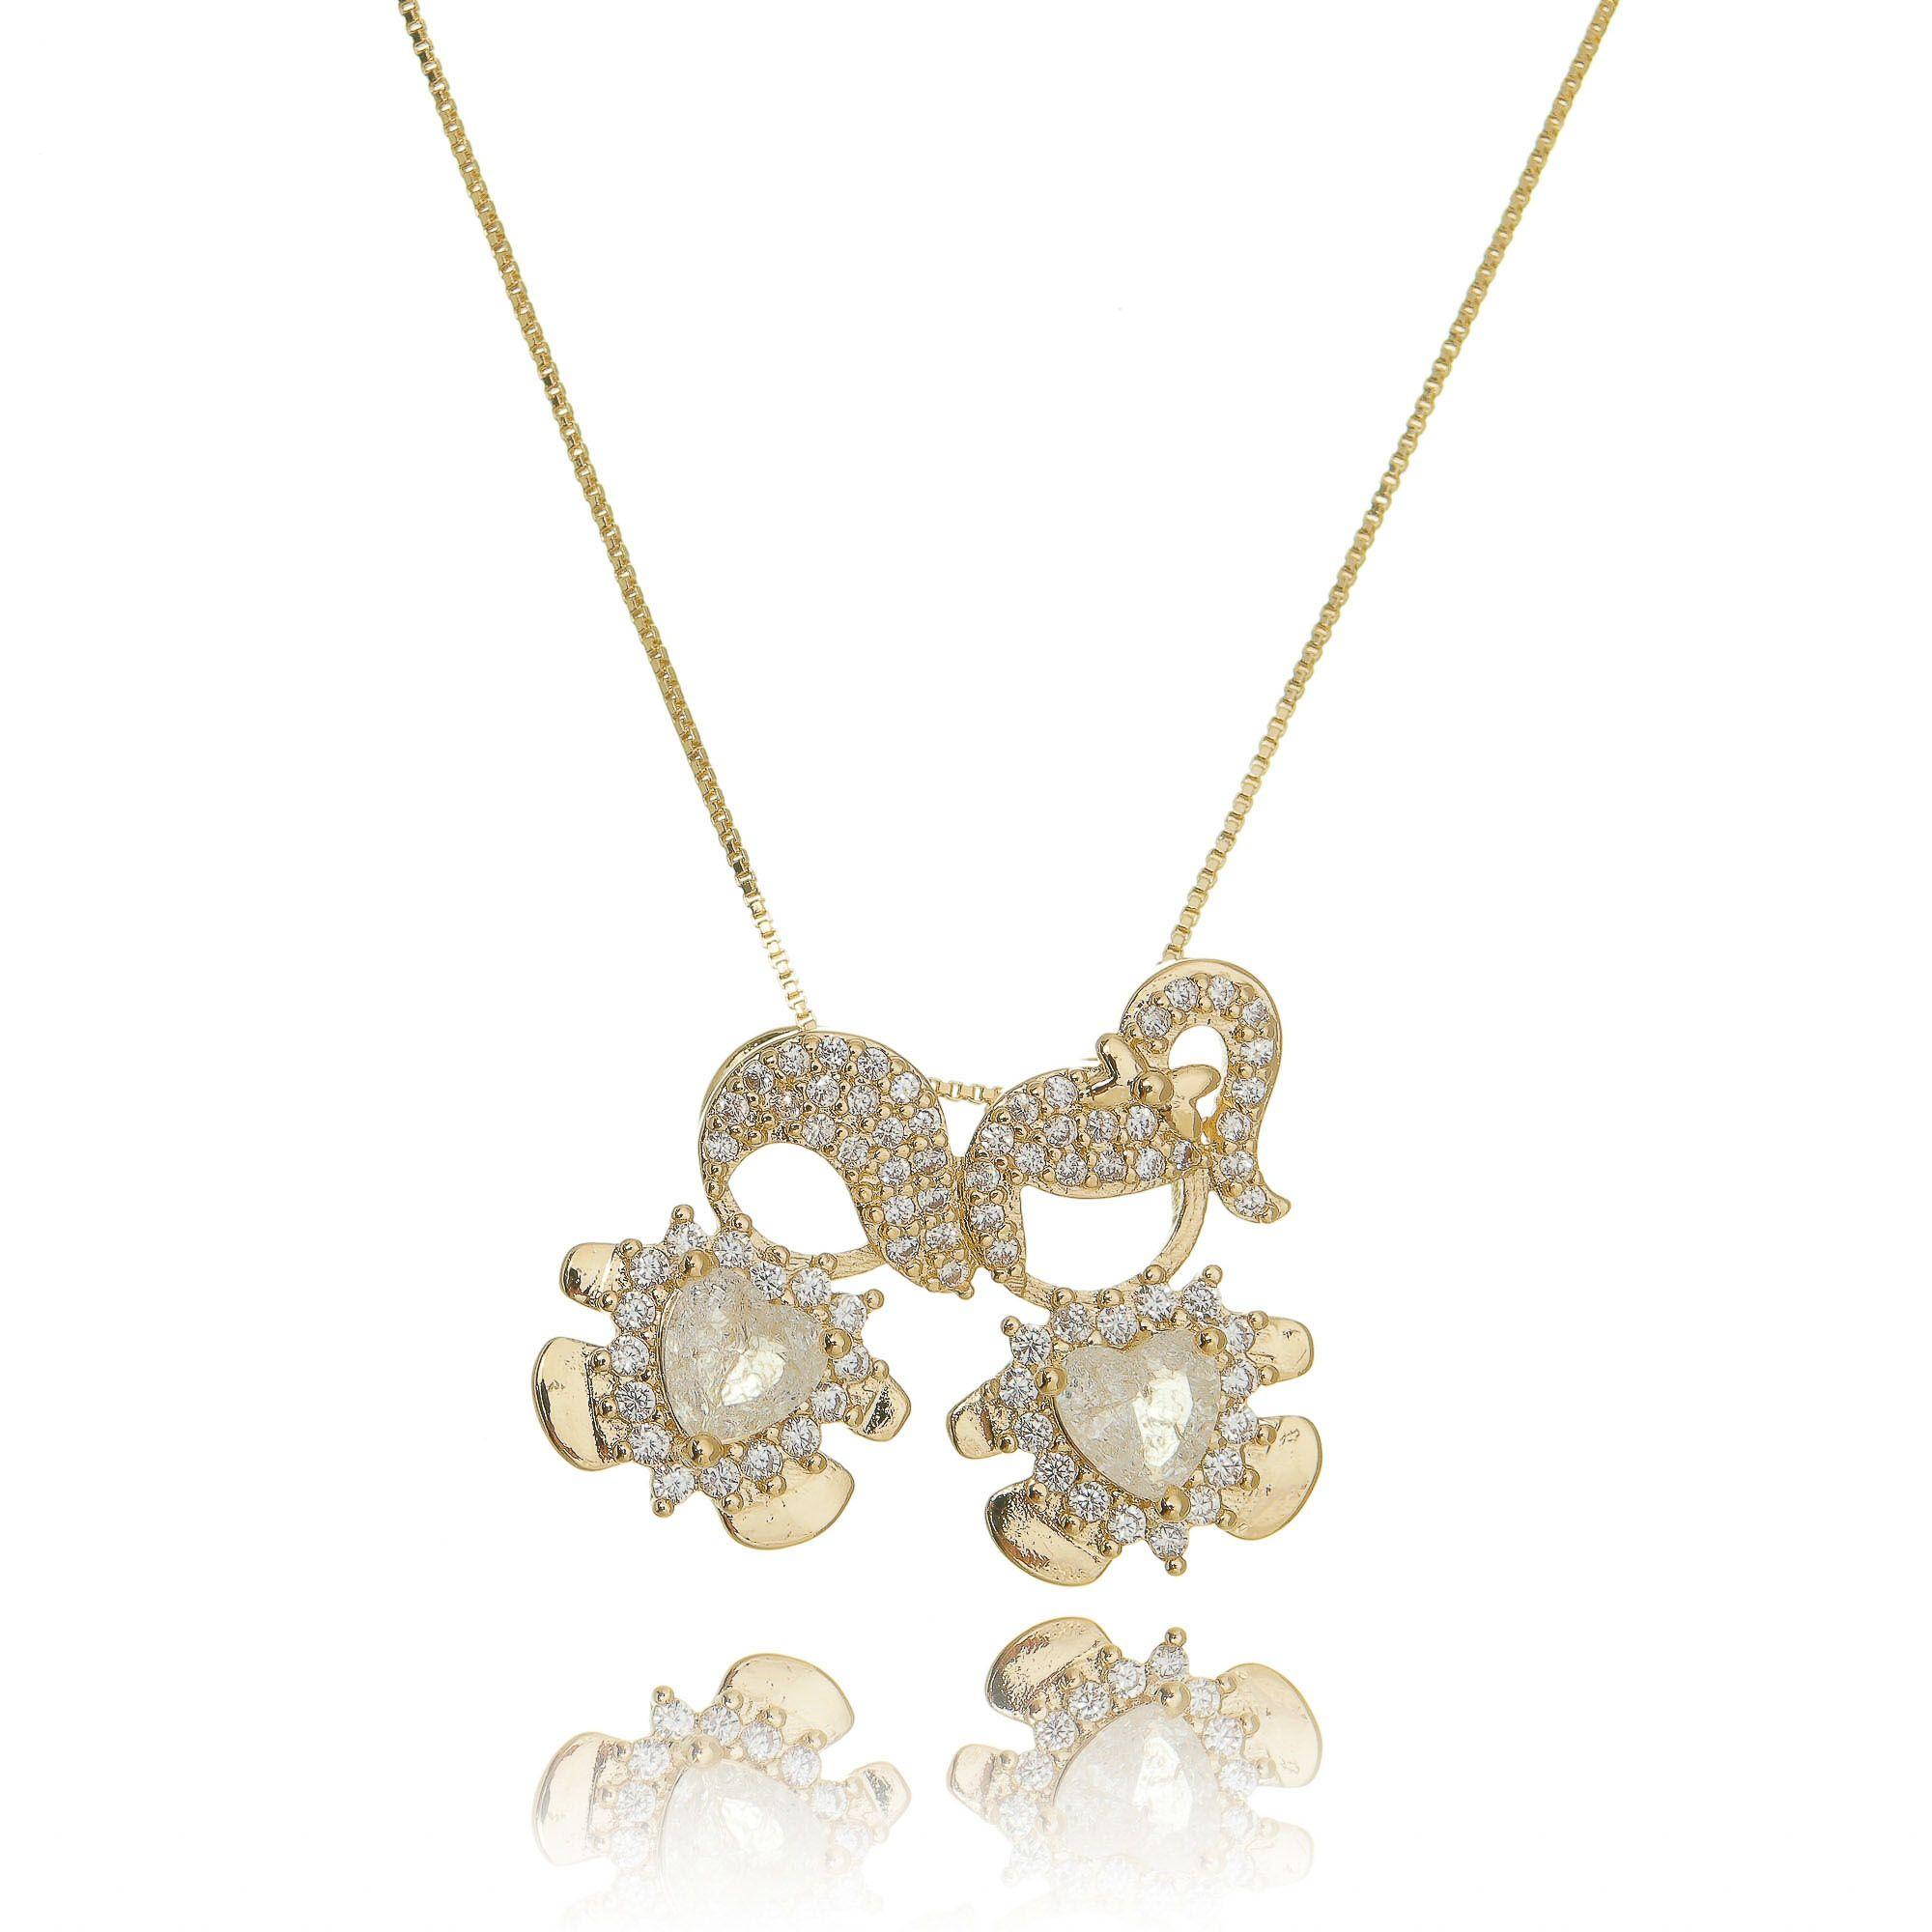 Colar Pingente 1 Menina e 1 Menino de Zircônia e Pedra Fusion Cristal Semijoia Ouro 18K  - Soloyou